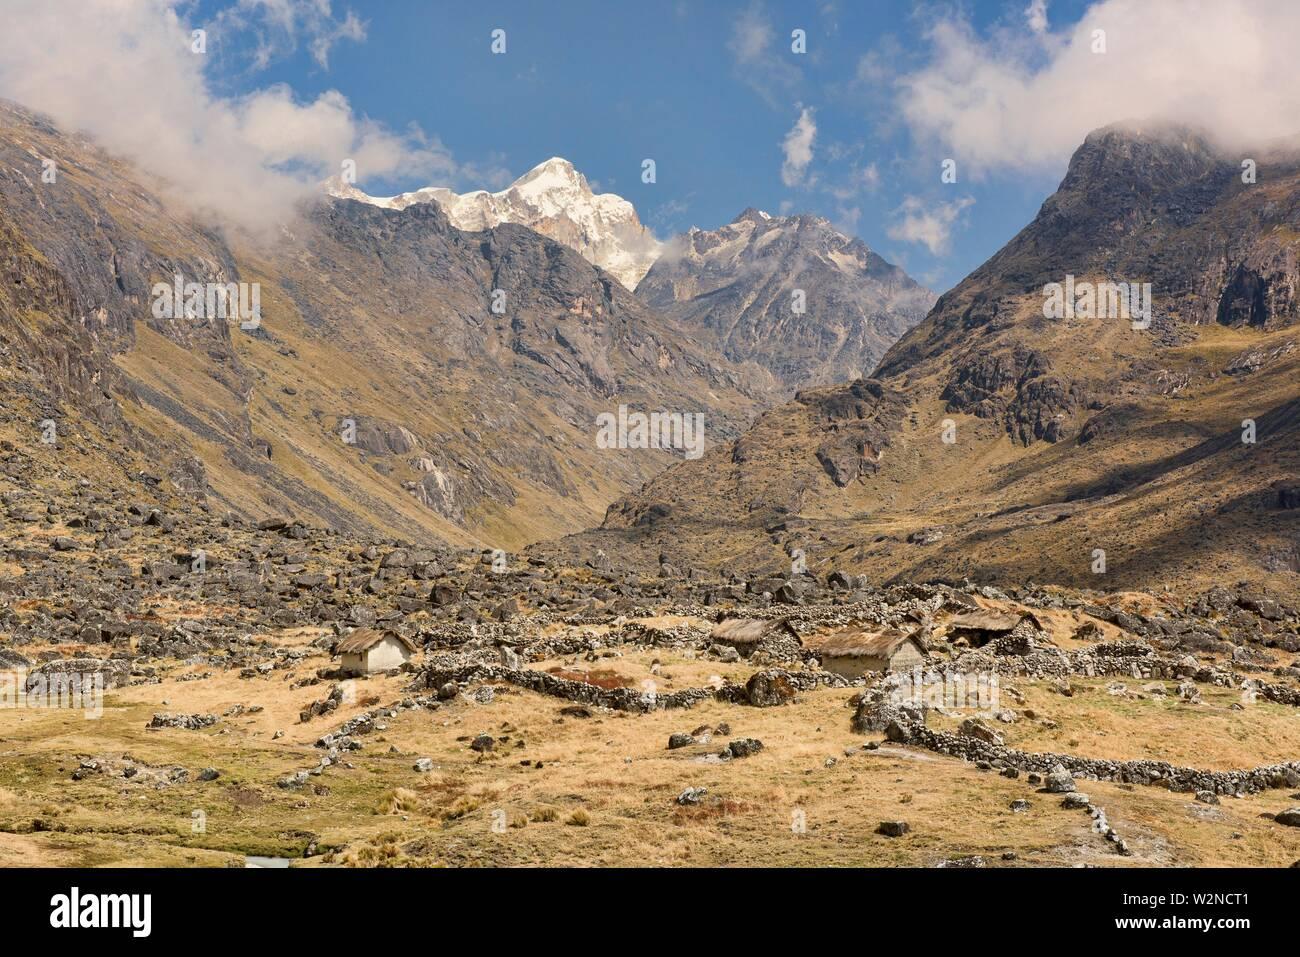 Trekking across the Cordillera Real mountain range, Bolivia. - Stock Image